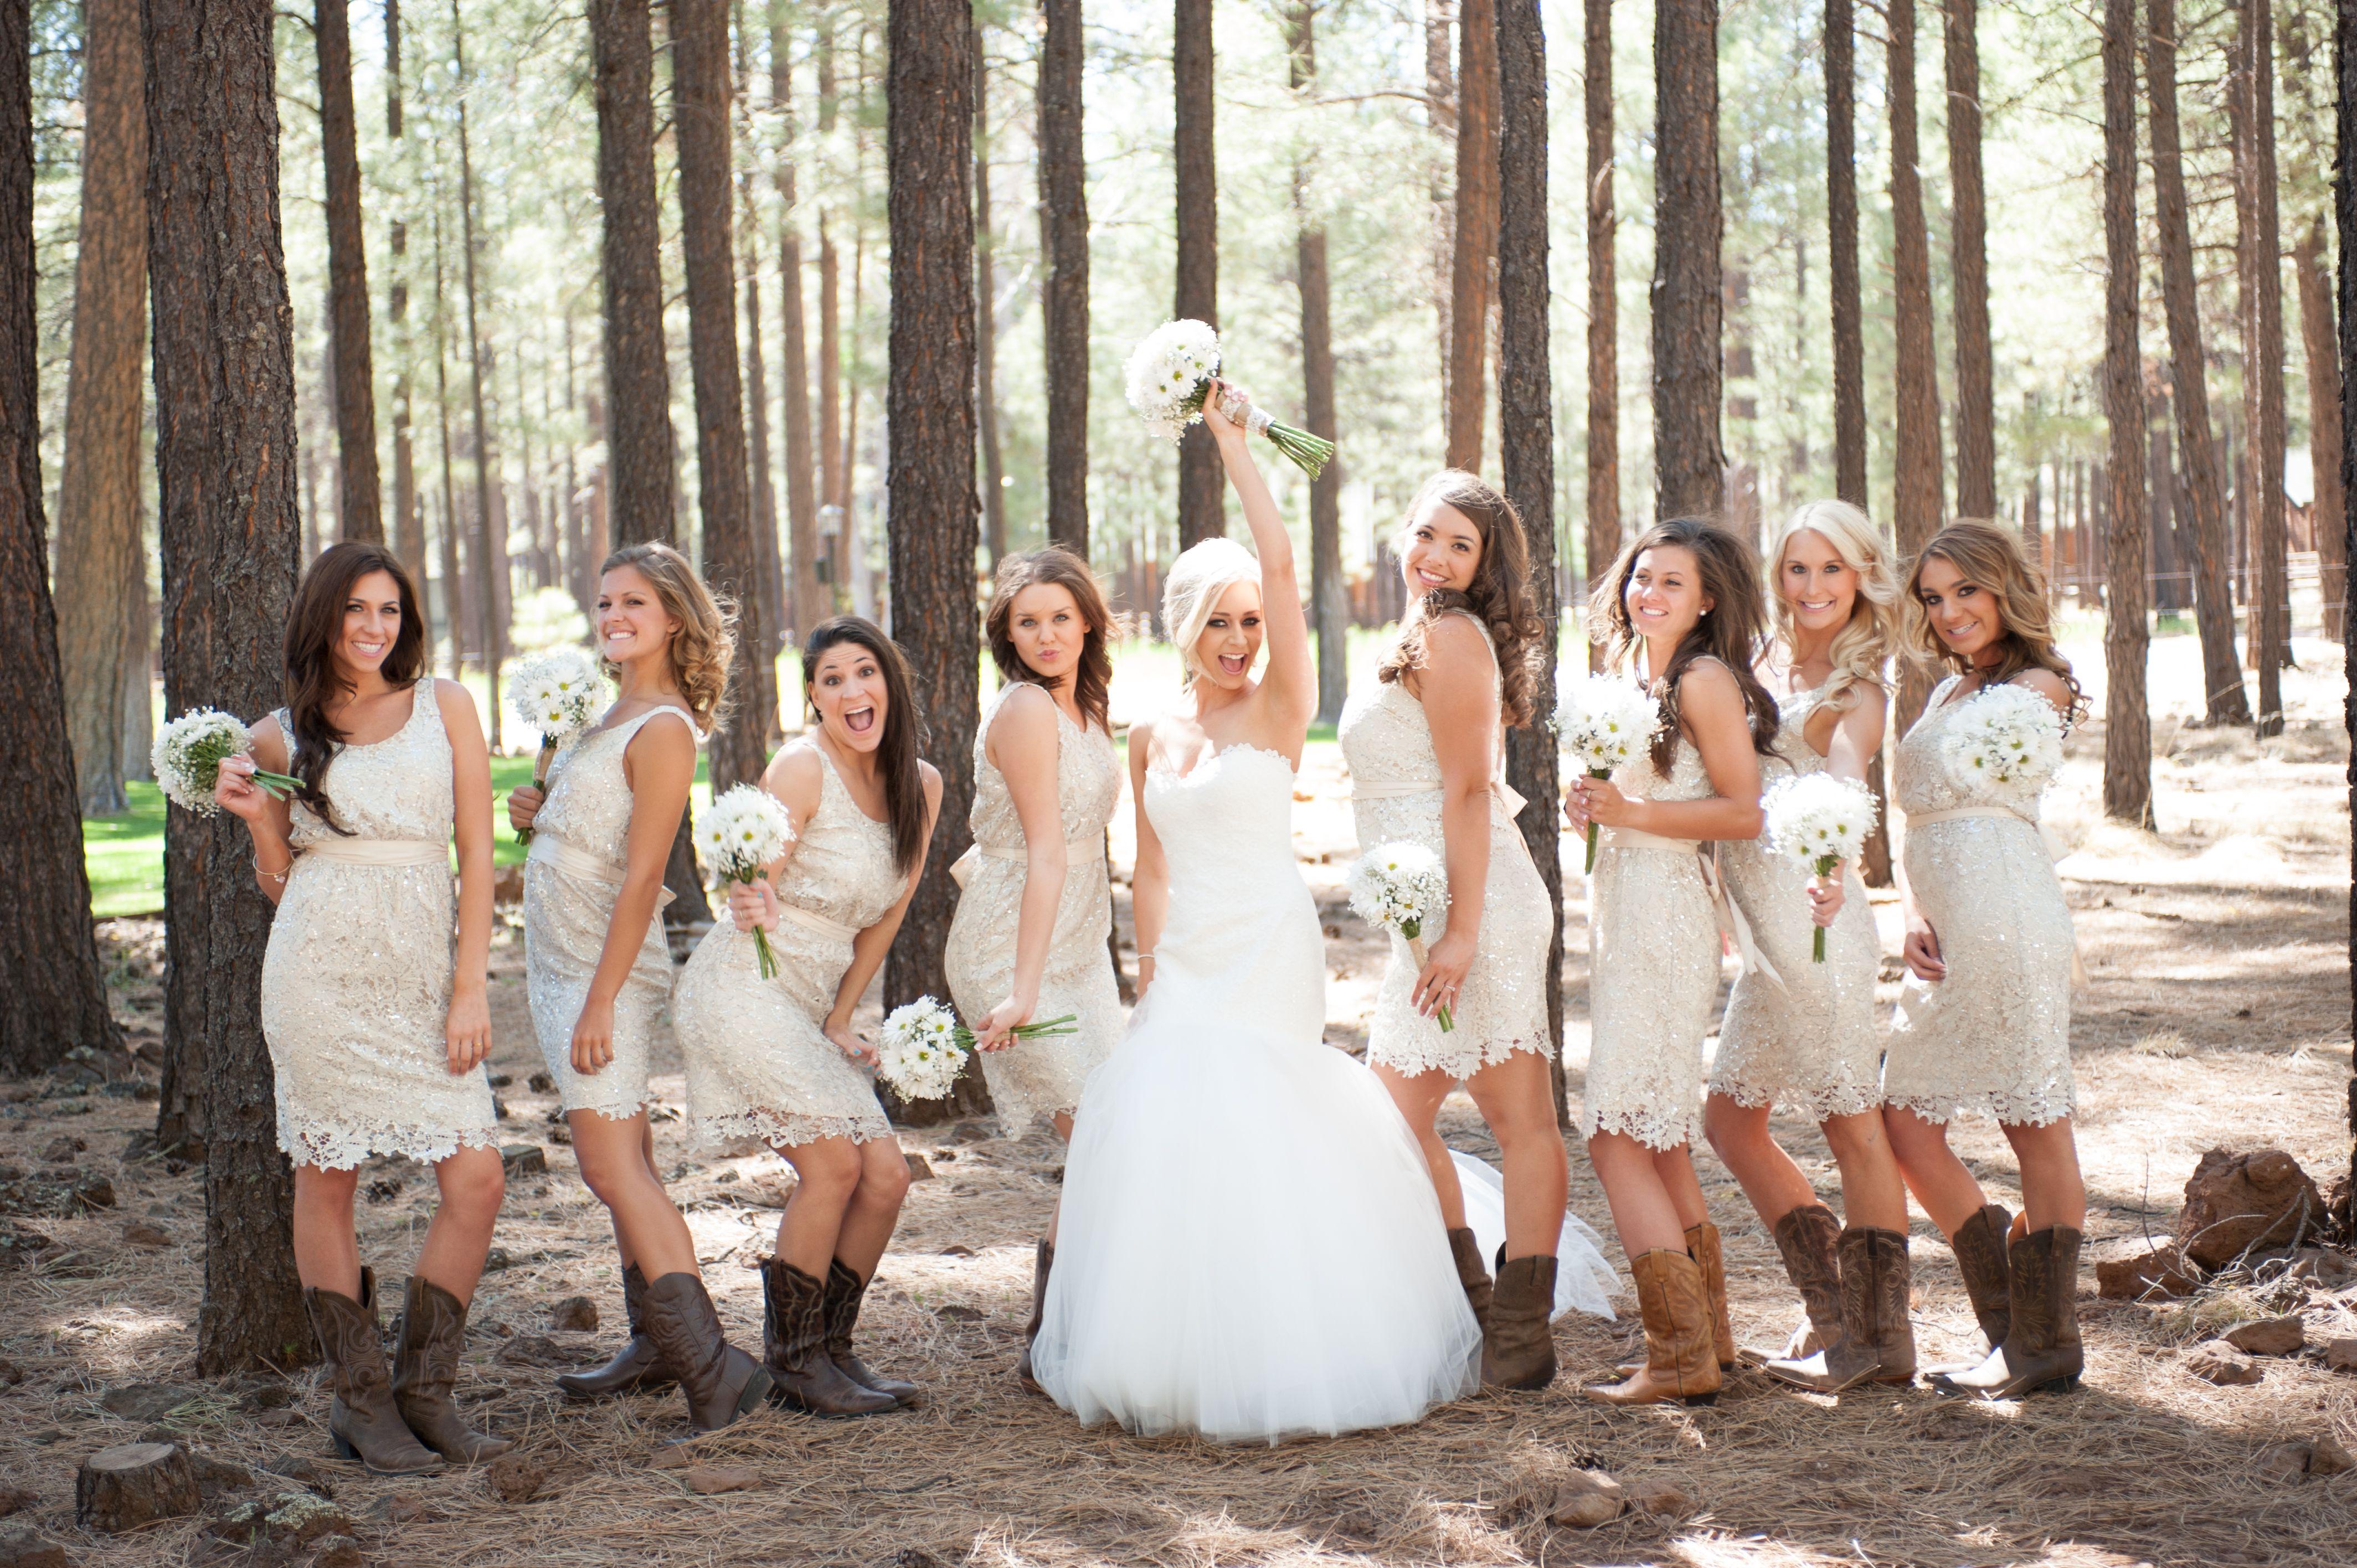 outdoor wedding dresses Bridesmaid